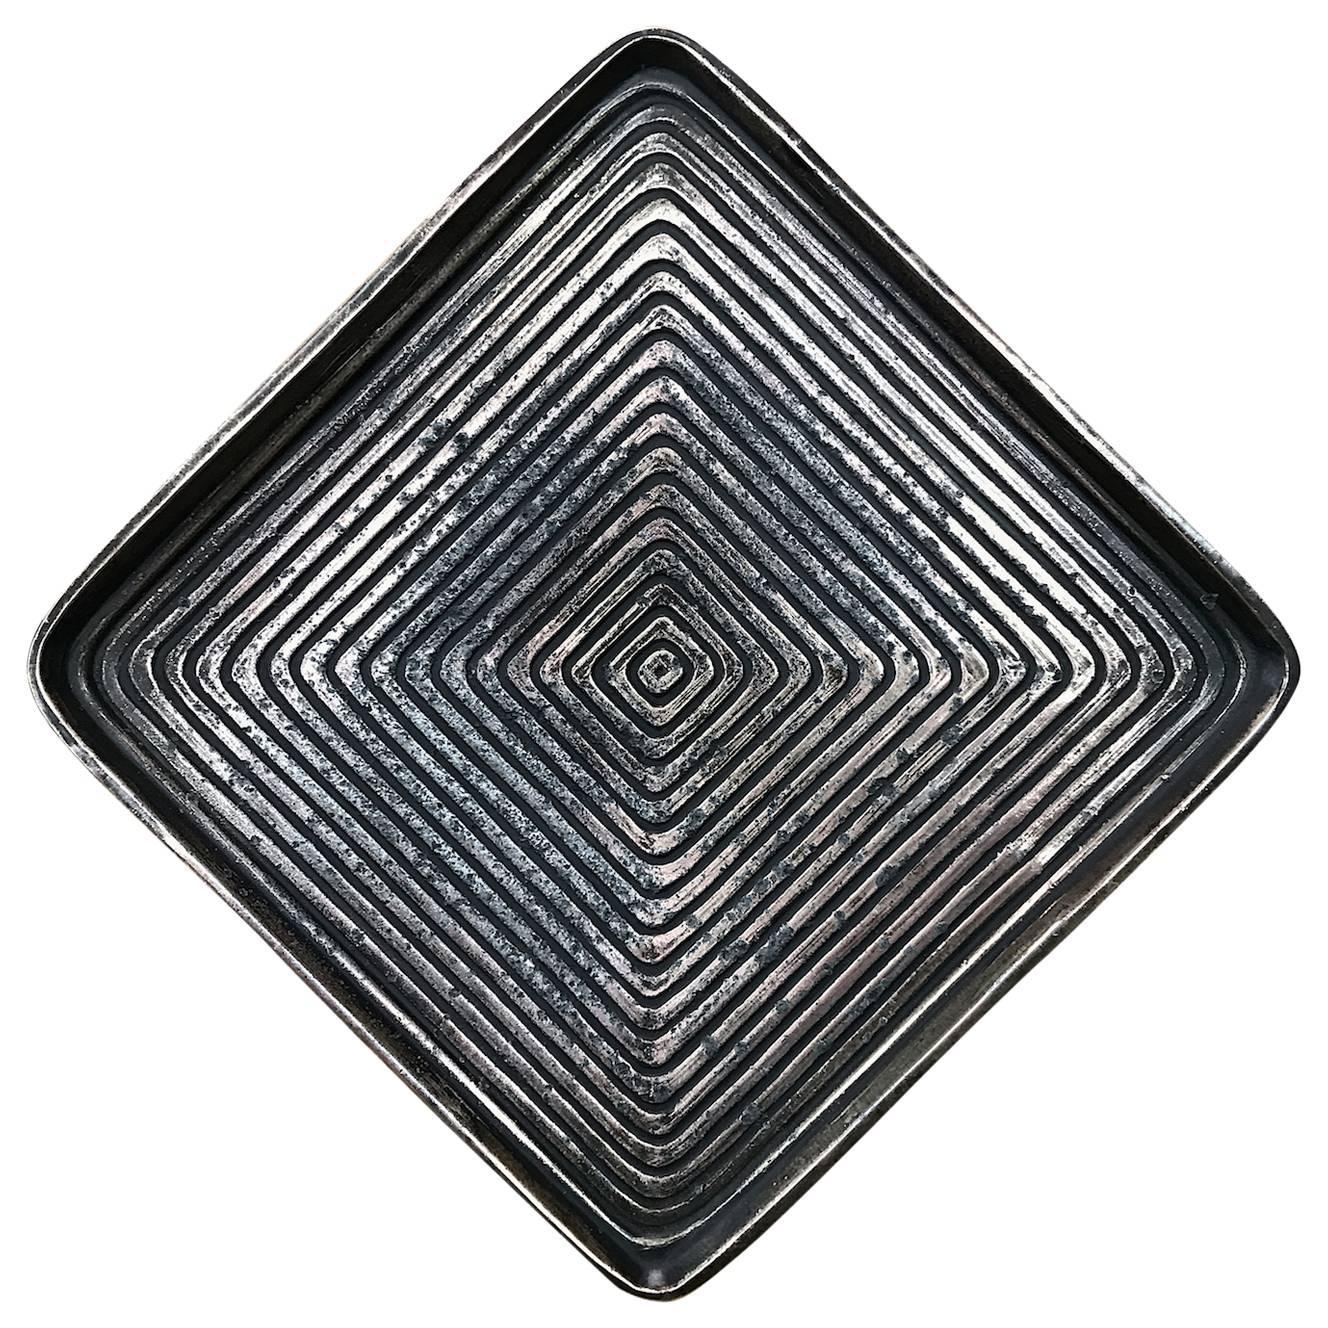 Ben Seibel for Jenfred Ware Concentric Geometric Brass Tone Plate Dish Ashtray